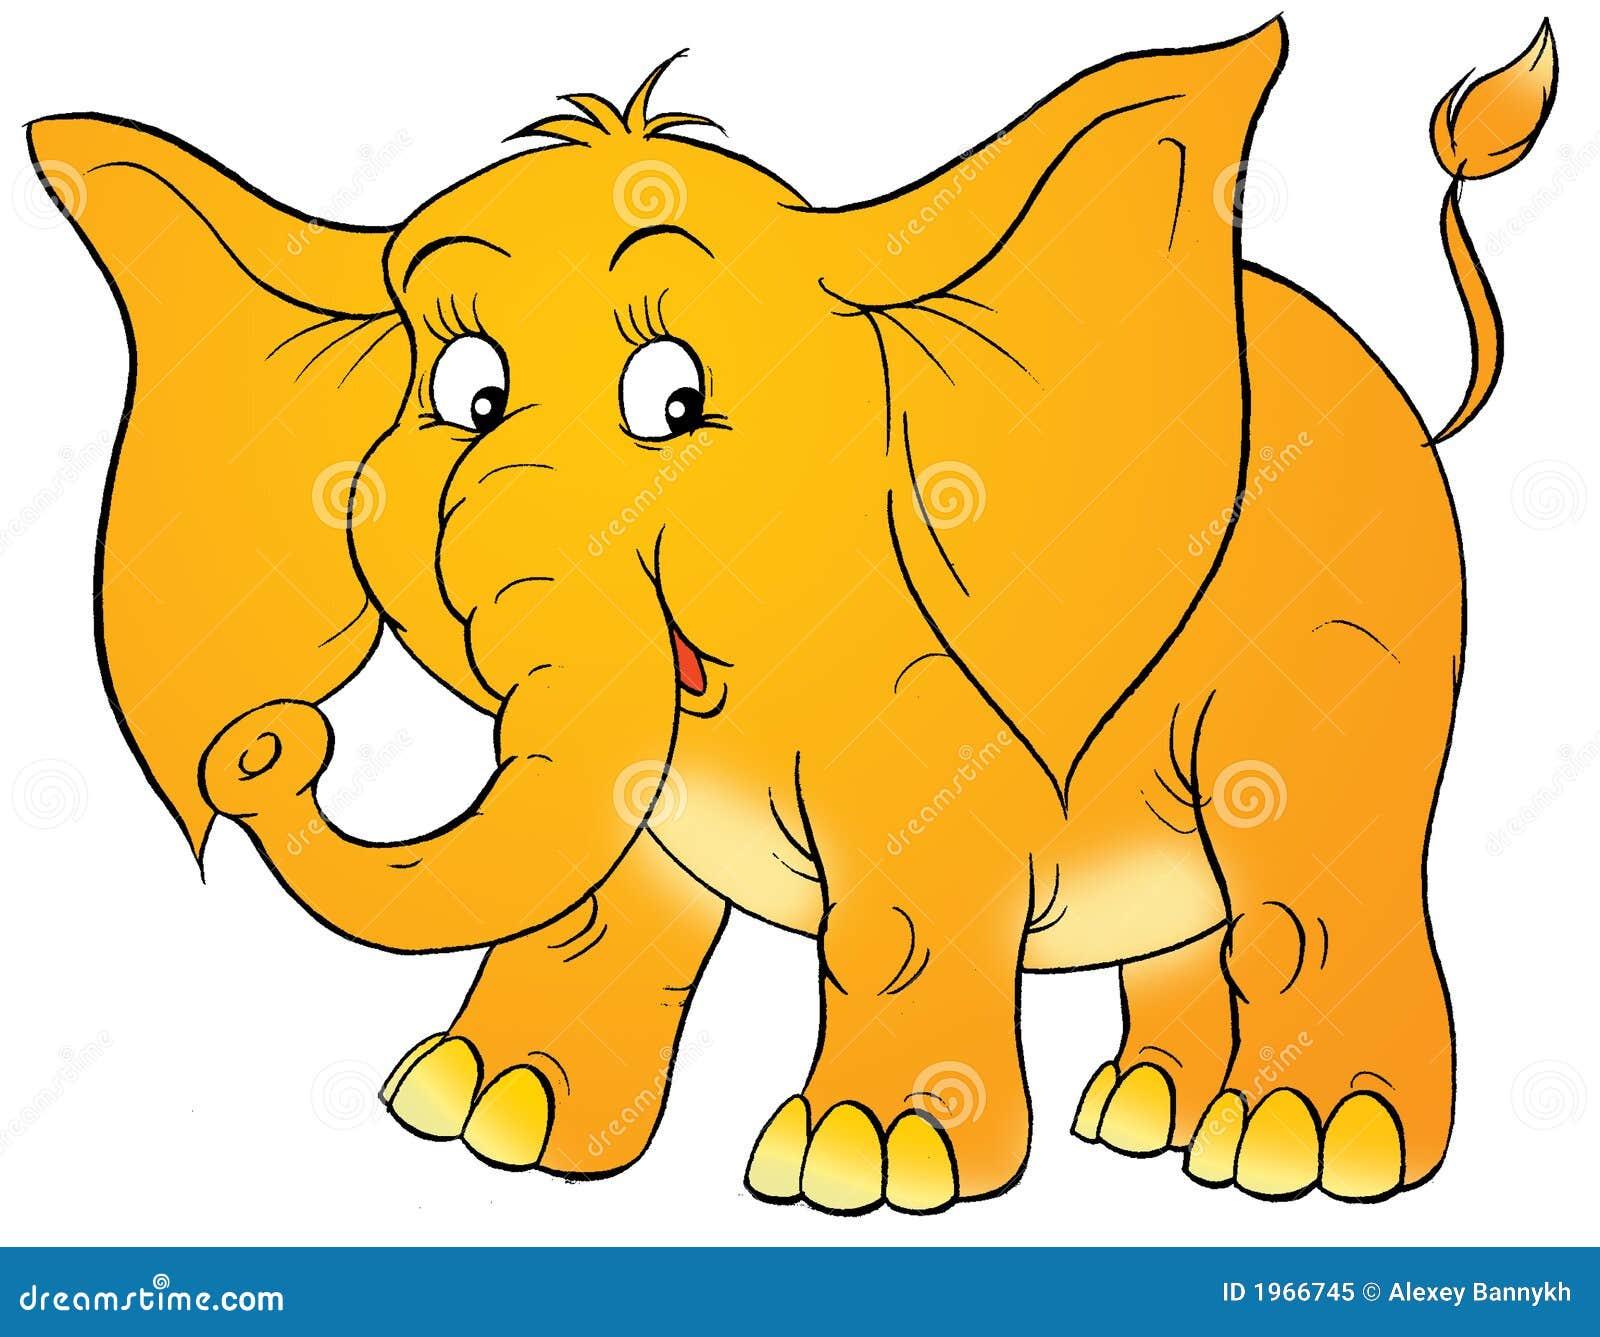 Cartoon elephant stock illustration. Illustration of ...